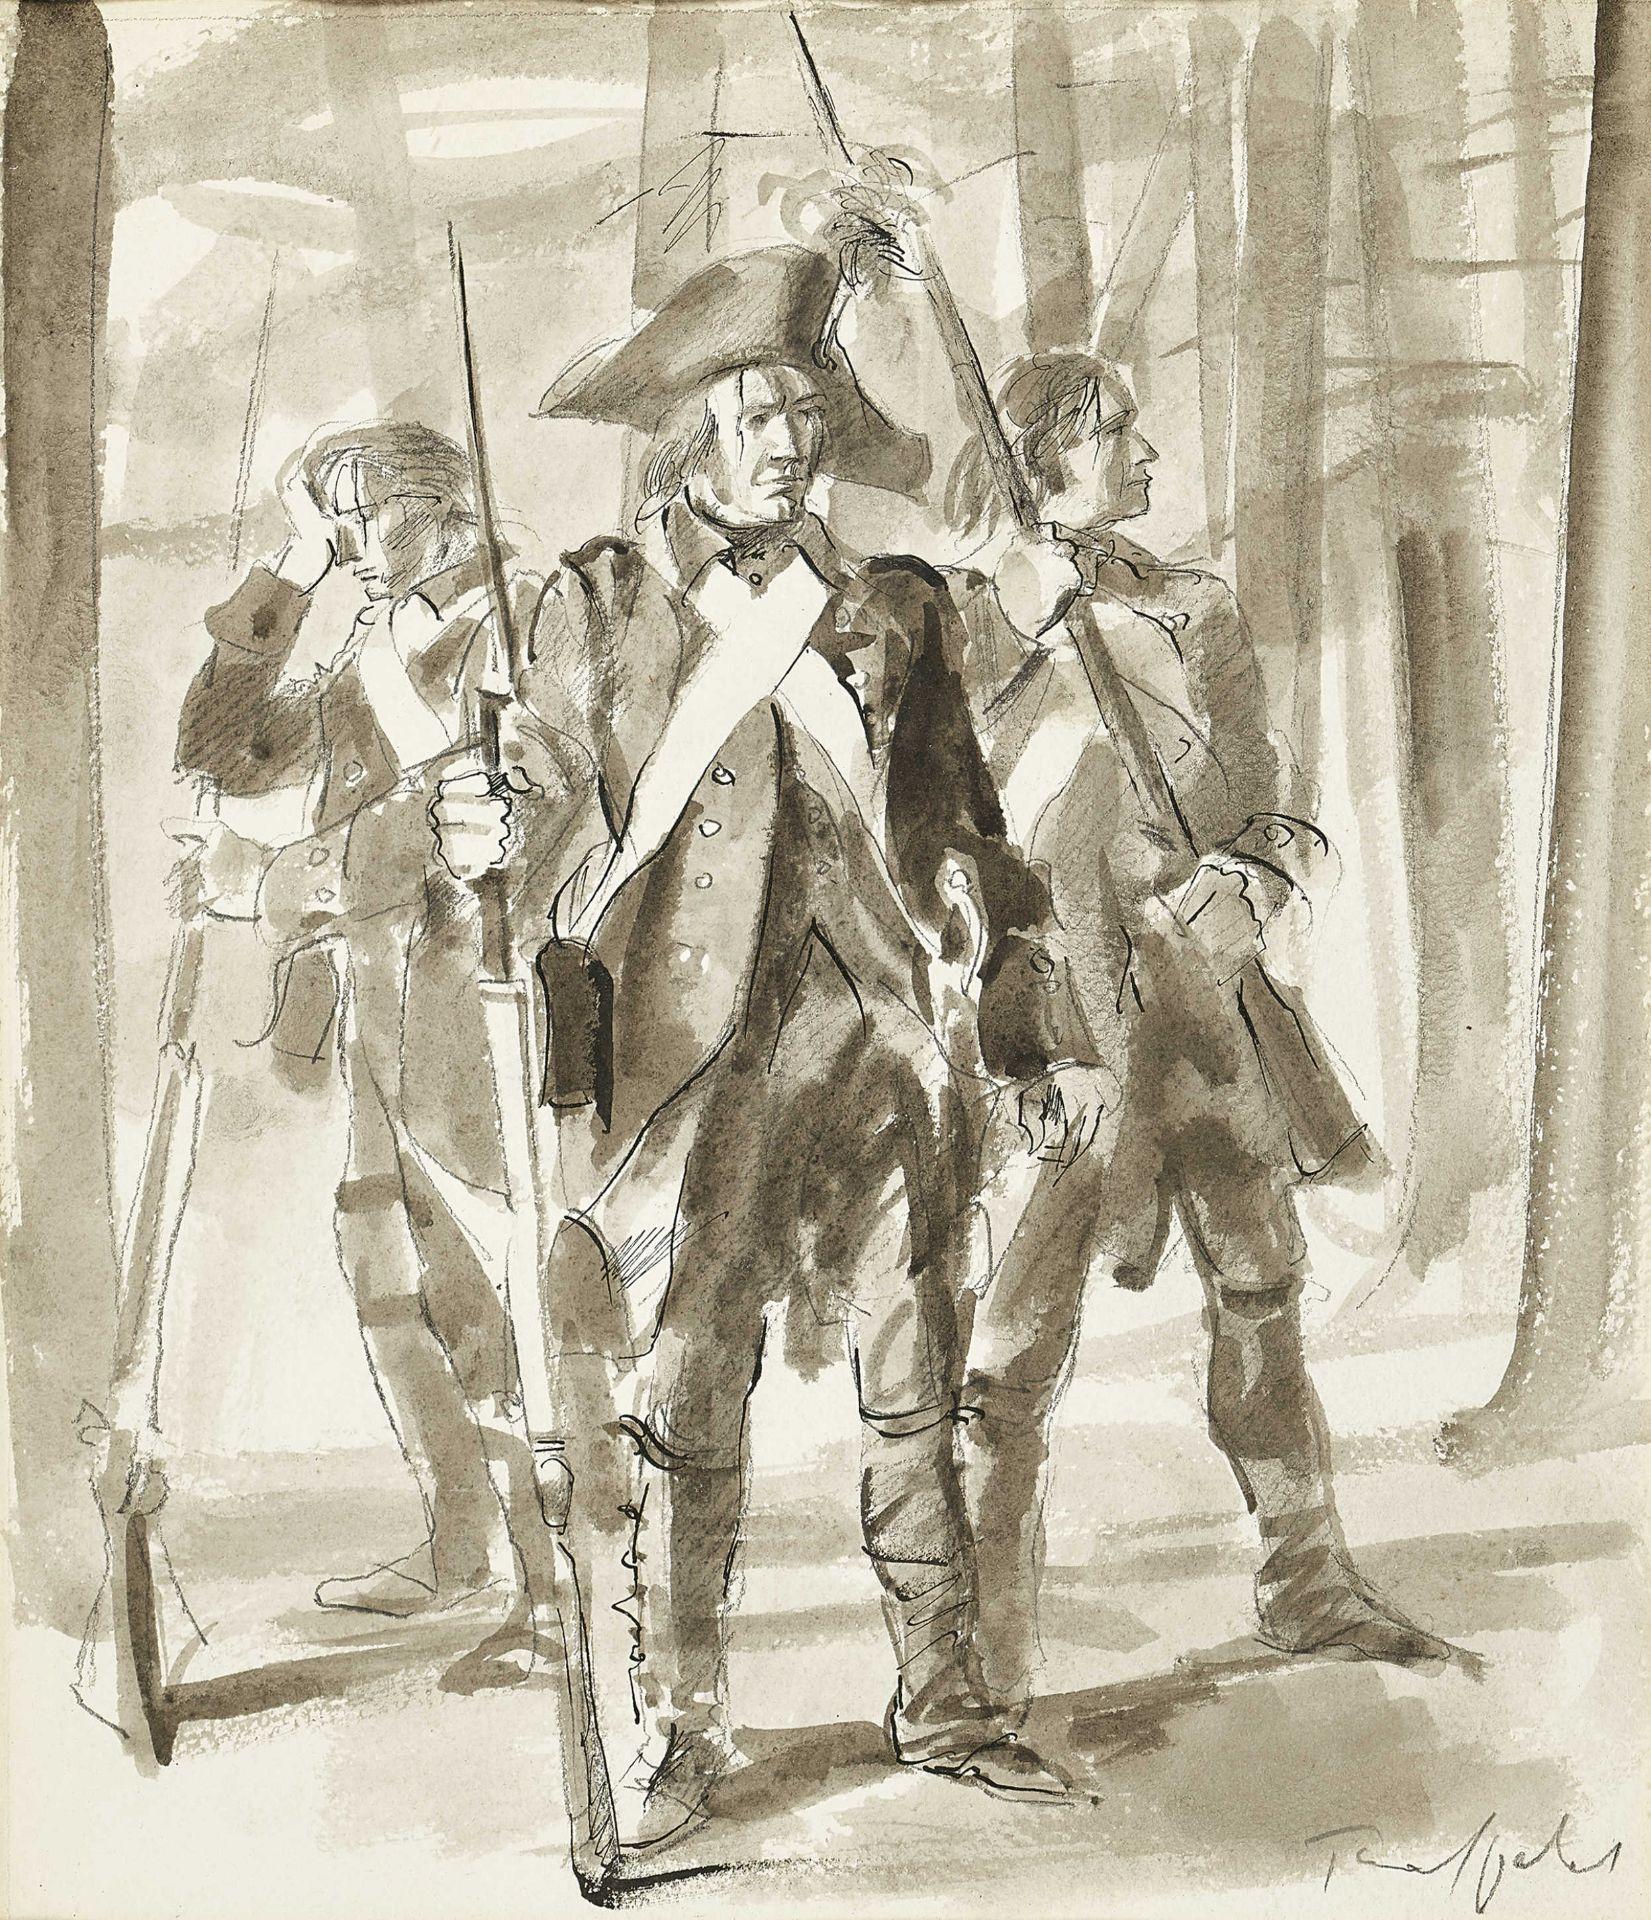 TRAFFELET, FRIEDRICH: Soldaten im Wald.